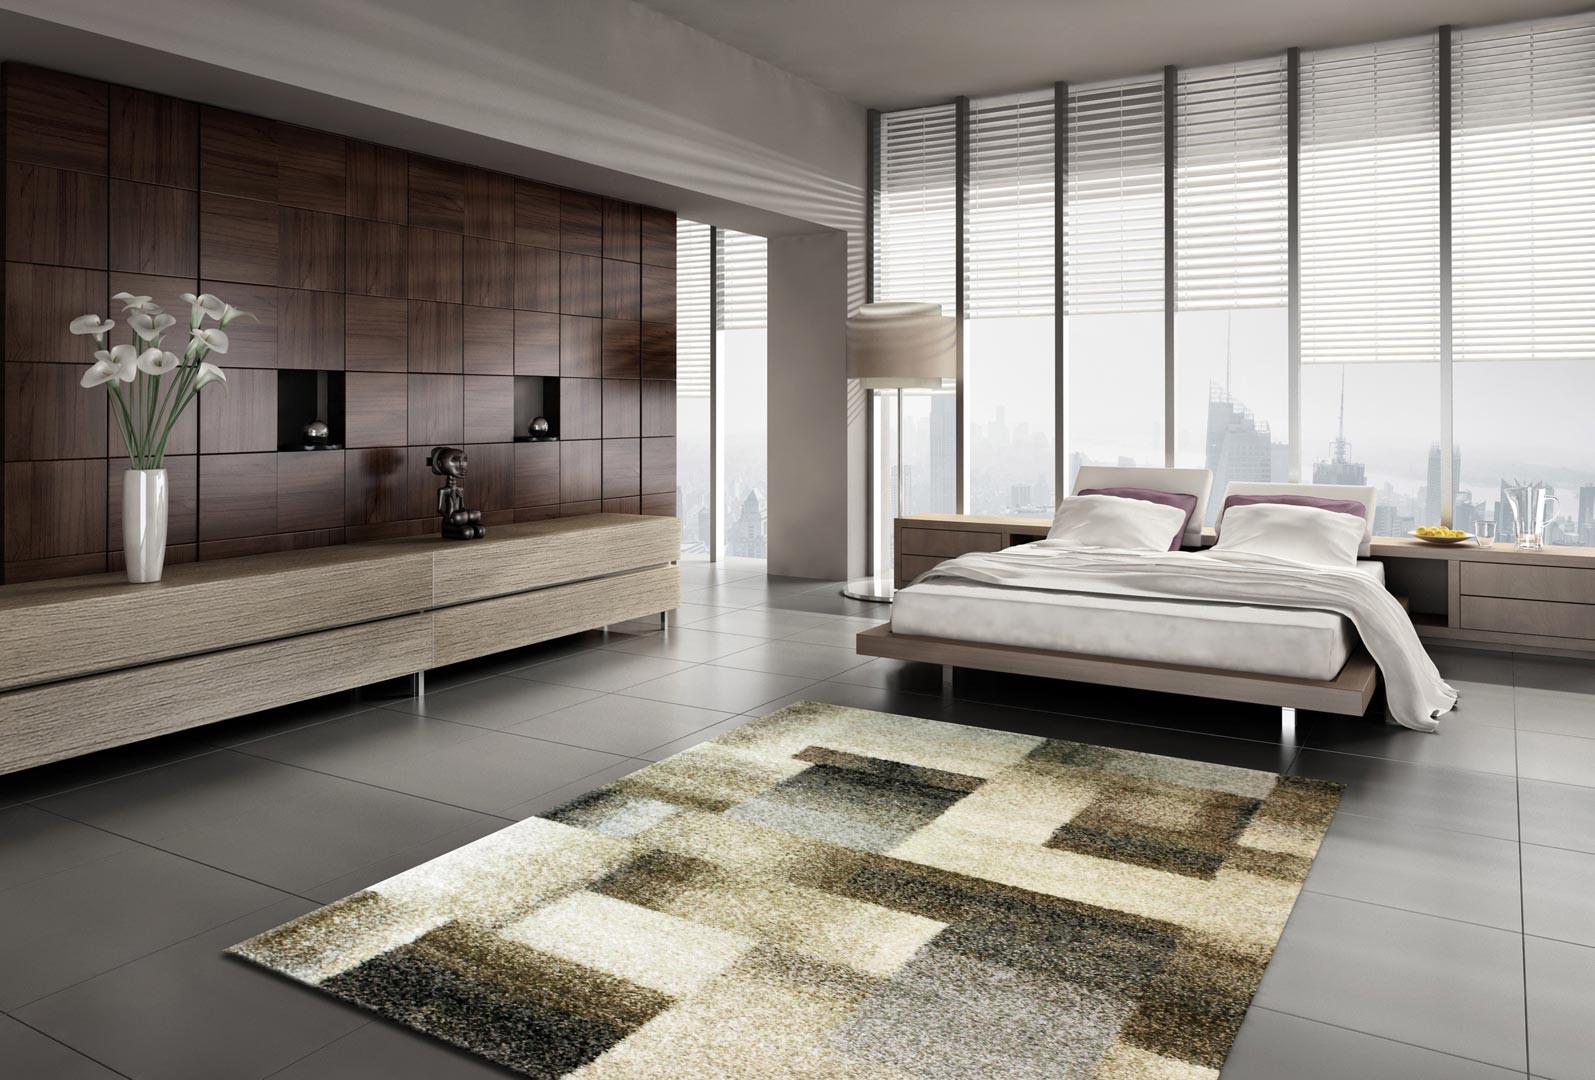 tapis g om trique beige pour salon zora. Black Bedroom Furniture Sets. Home Design Ideas